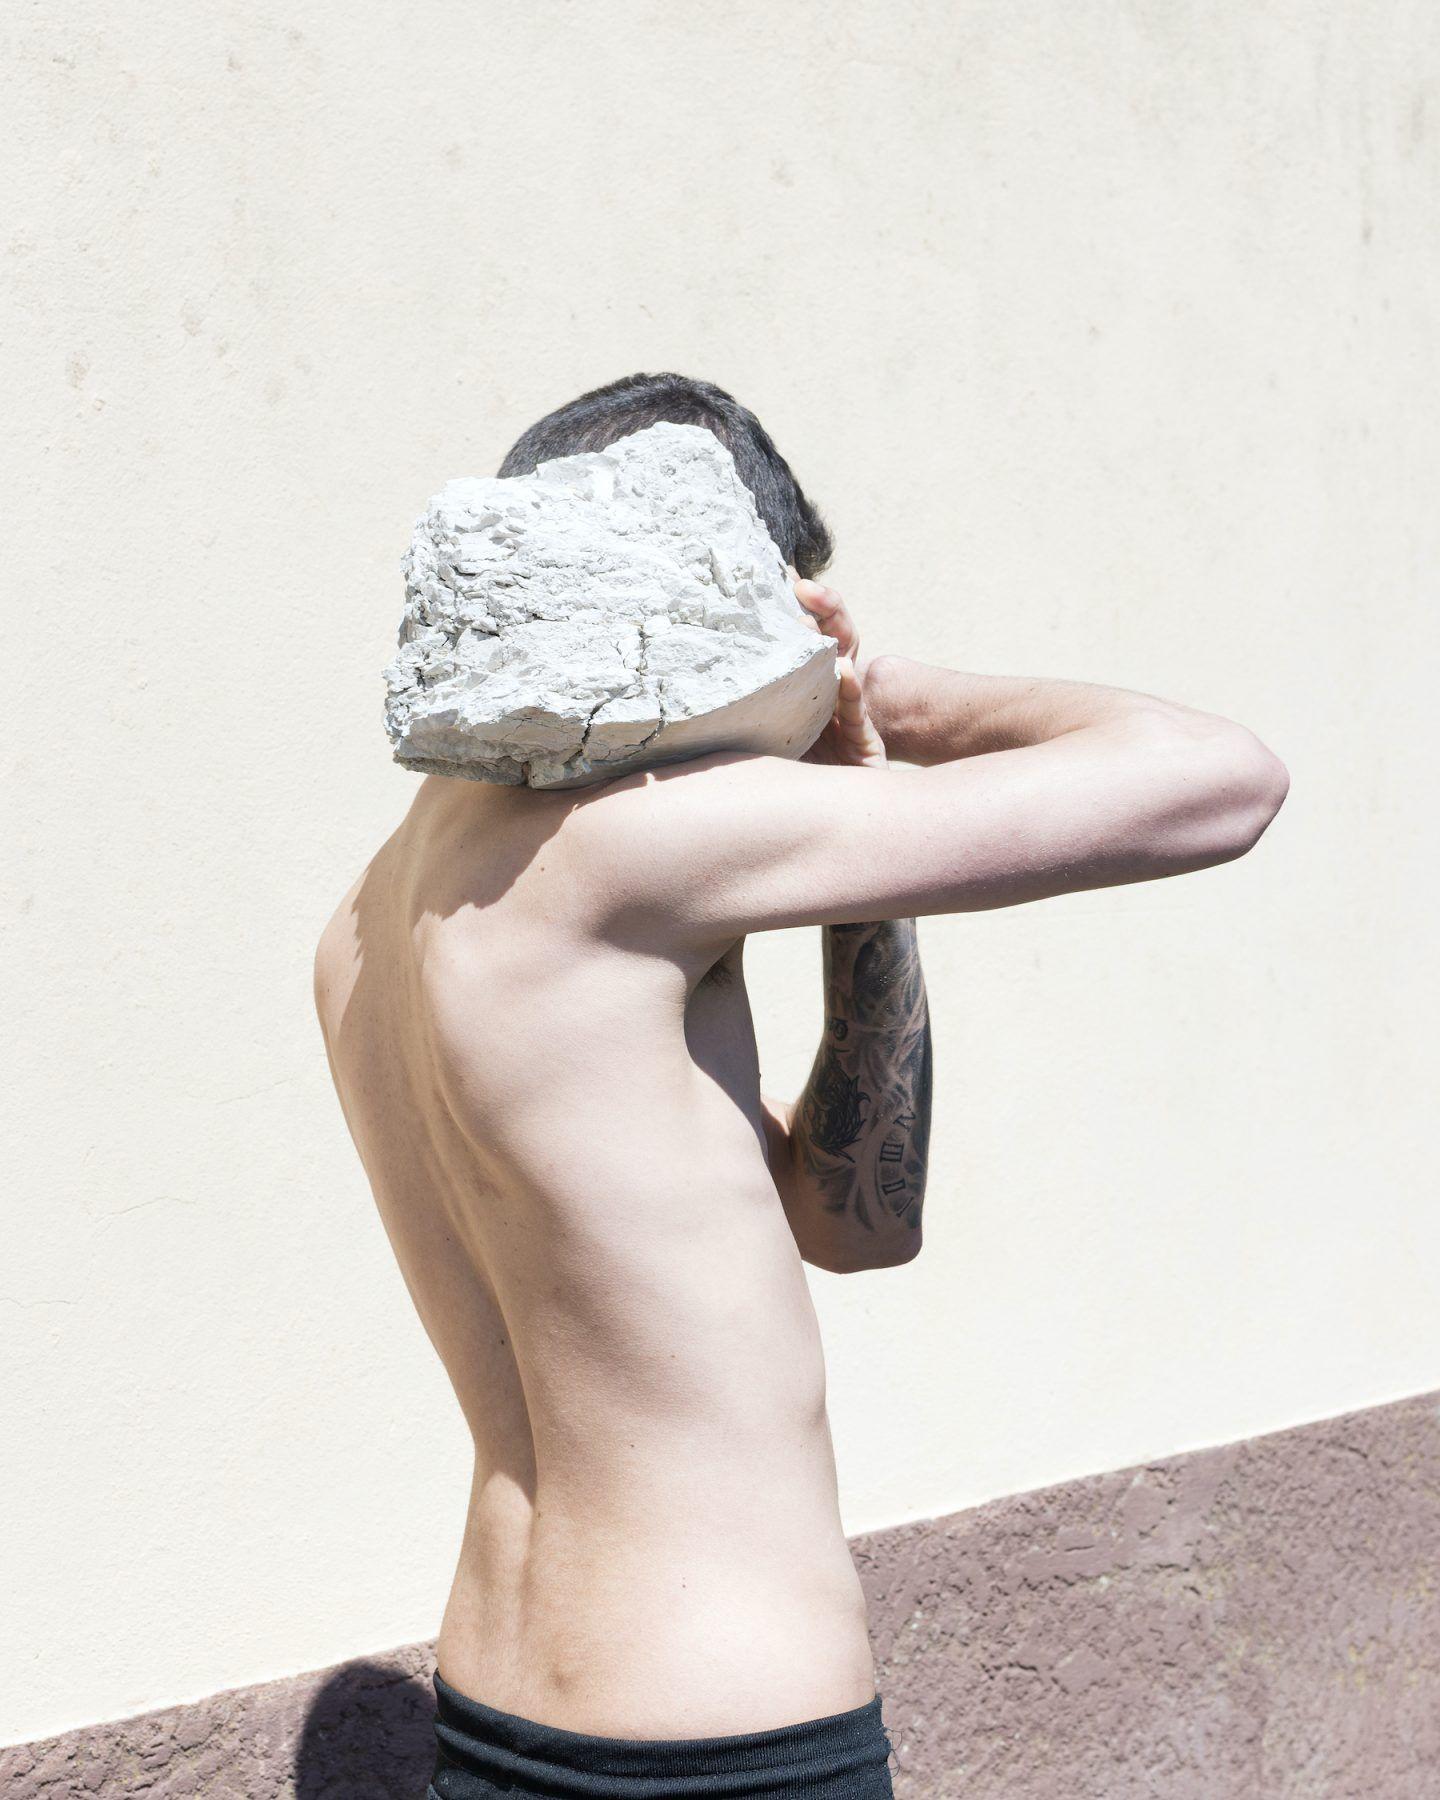 IGNANT-PHOTOGRAPHY-INES-FERNANDES-PNEUMA-014